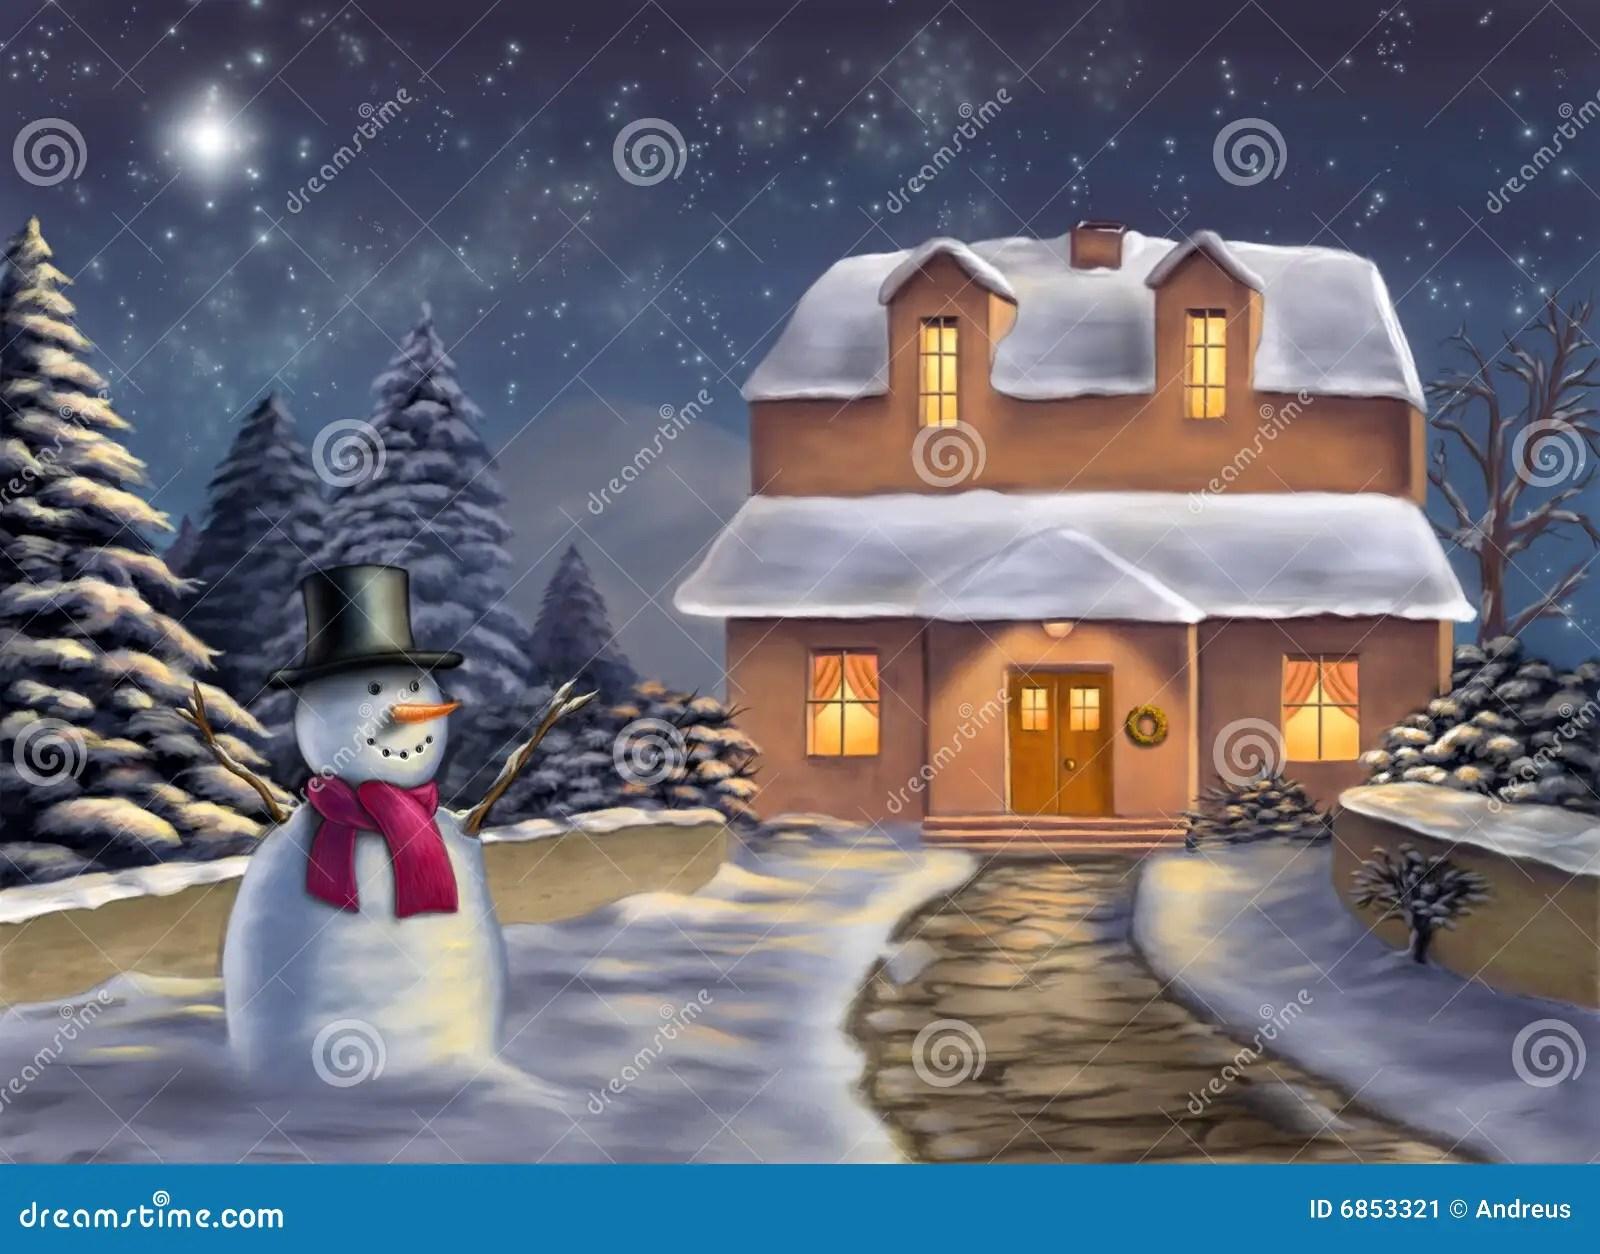 Paisaje de la Navidad stock de ilustracin Ilustracin de